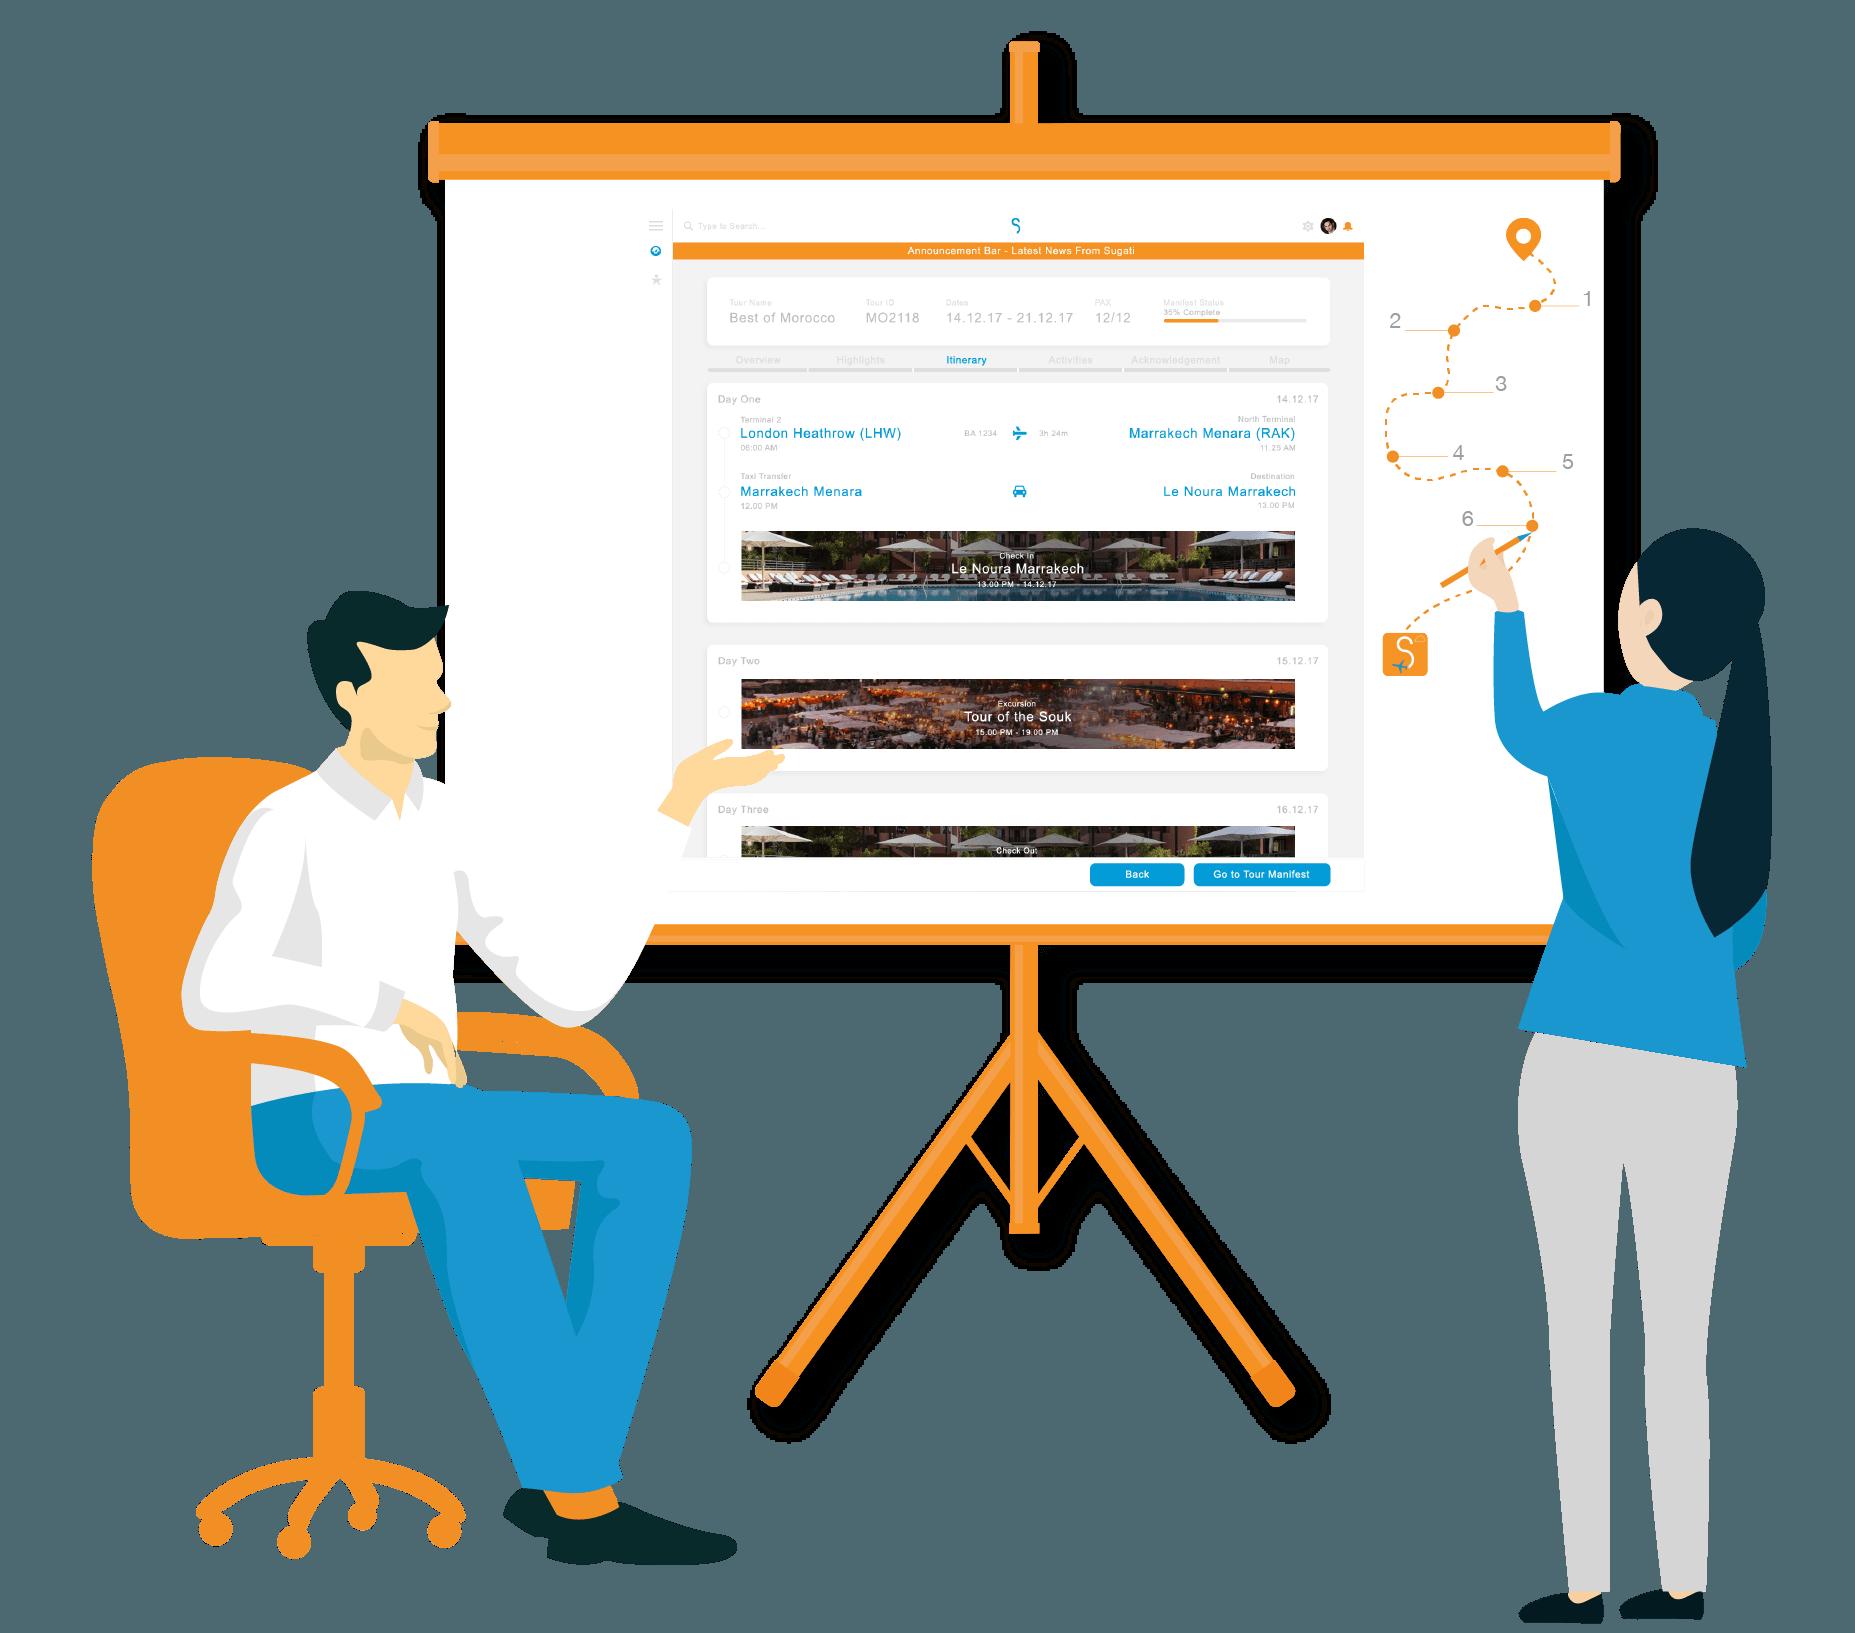 Sugati | Salesforce based Travel CRM | Itinerary Builder